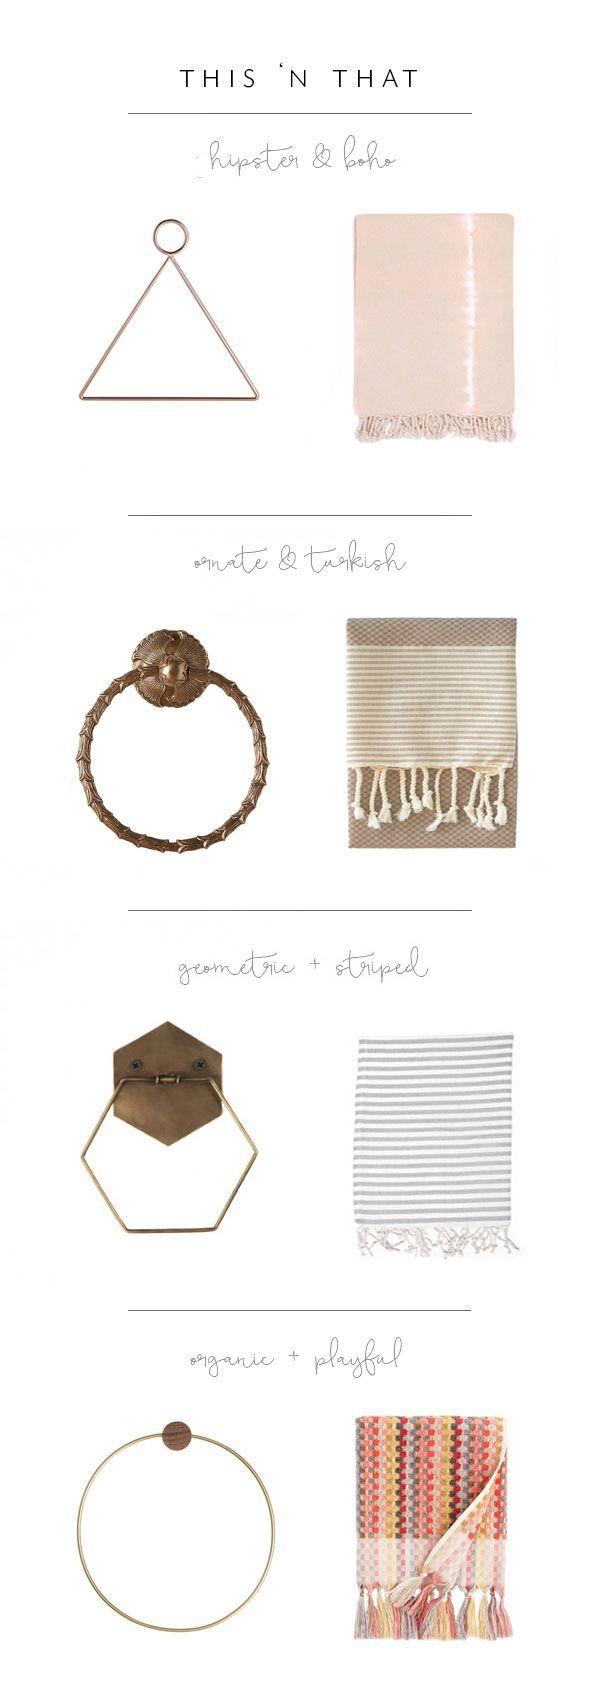 hand towel and towel ring pairings - boho eclectic   via coco kelley